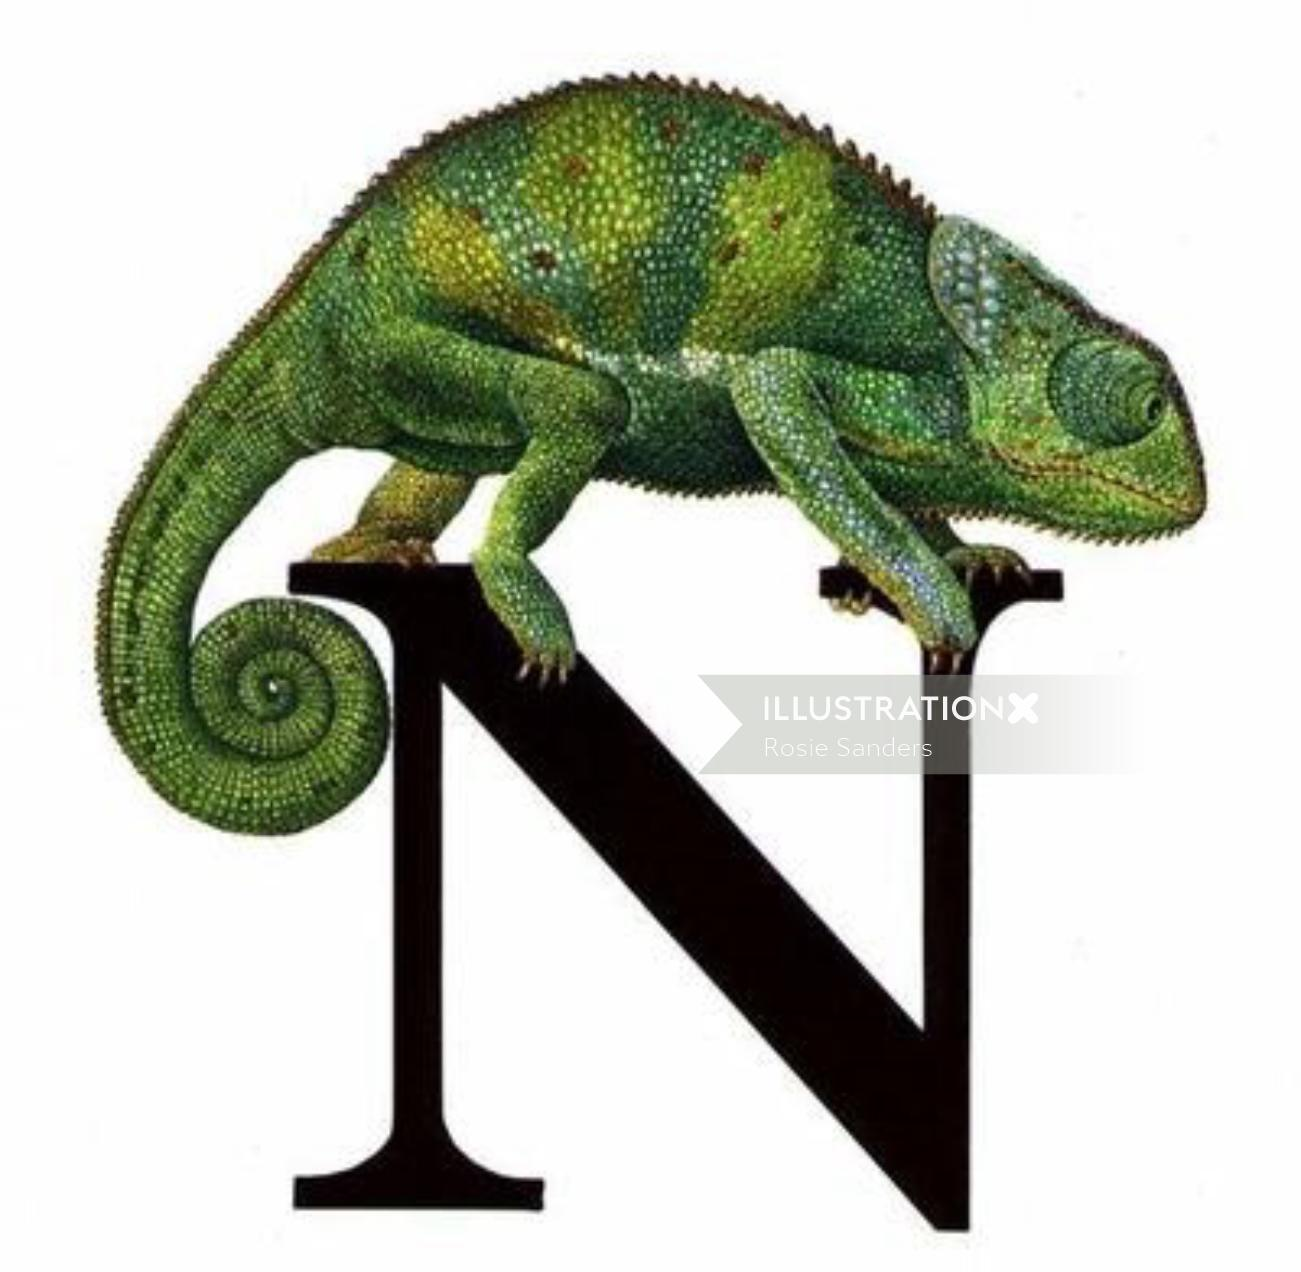 Chameleon illustration by Rosie Sanders